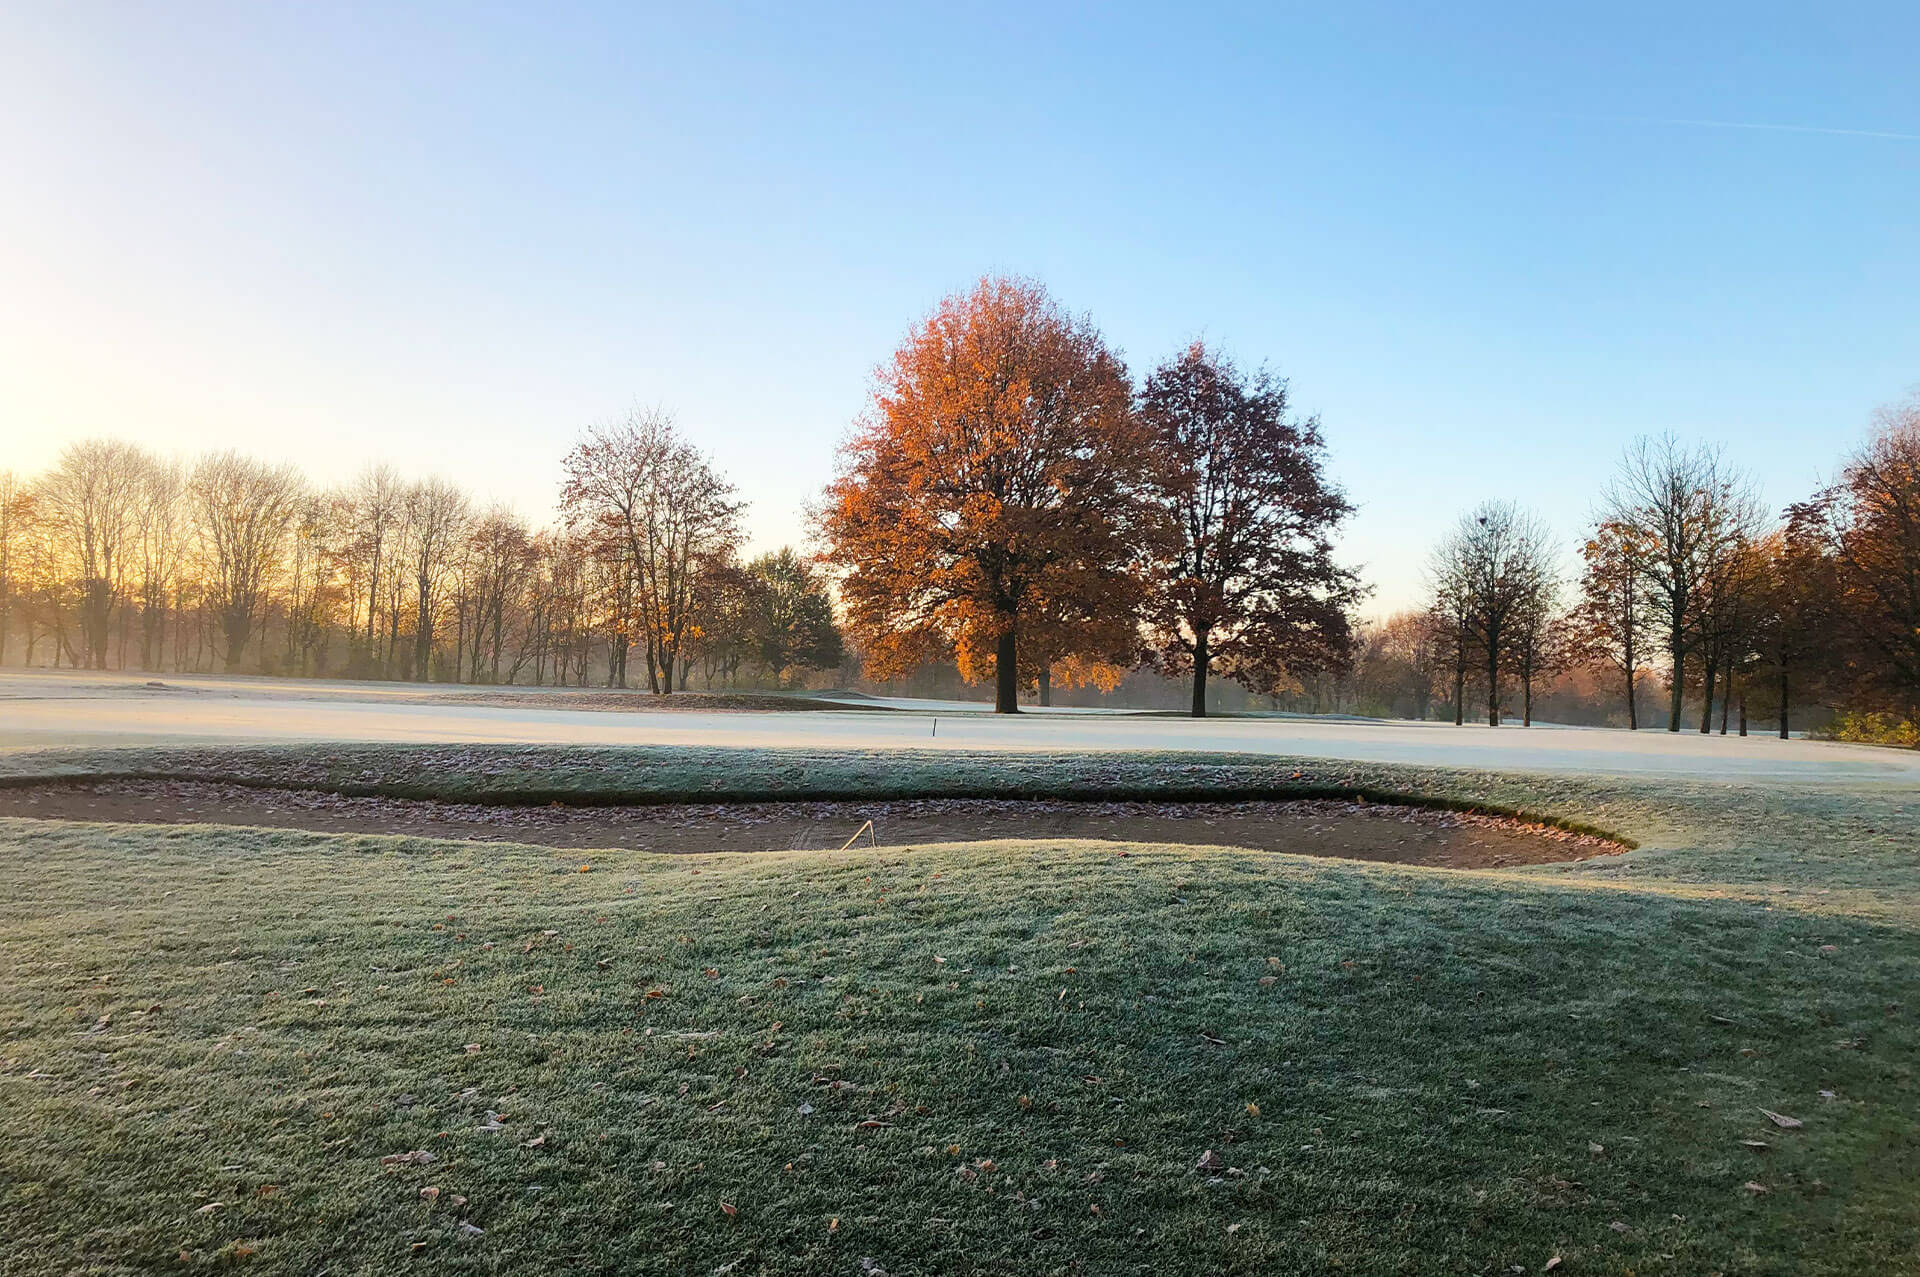 https://golfclub-peckeloh.de/wp-content/uploads/2021/02/Galeriebilder_1920_x_1277px-5.jpg